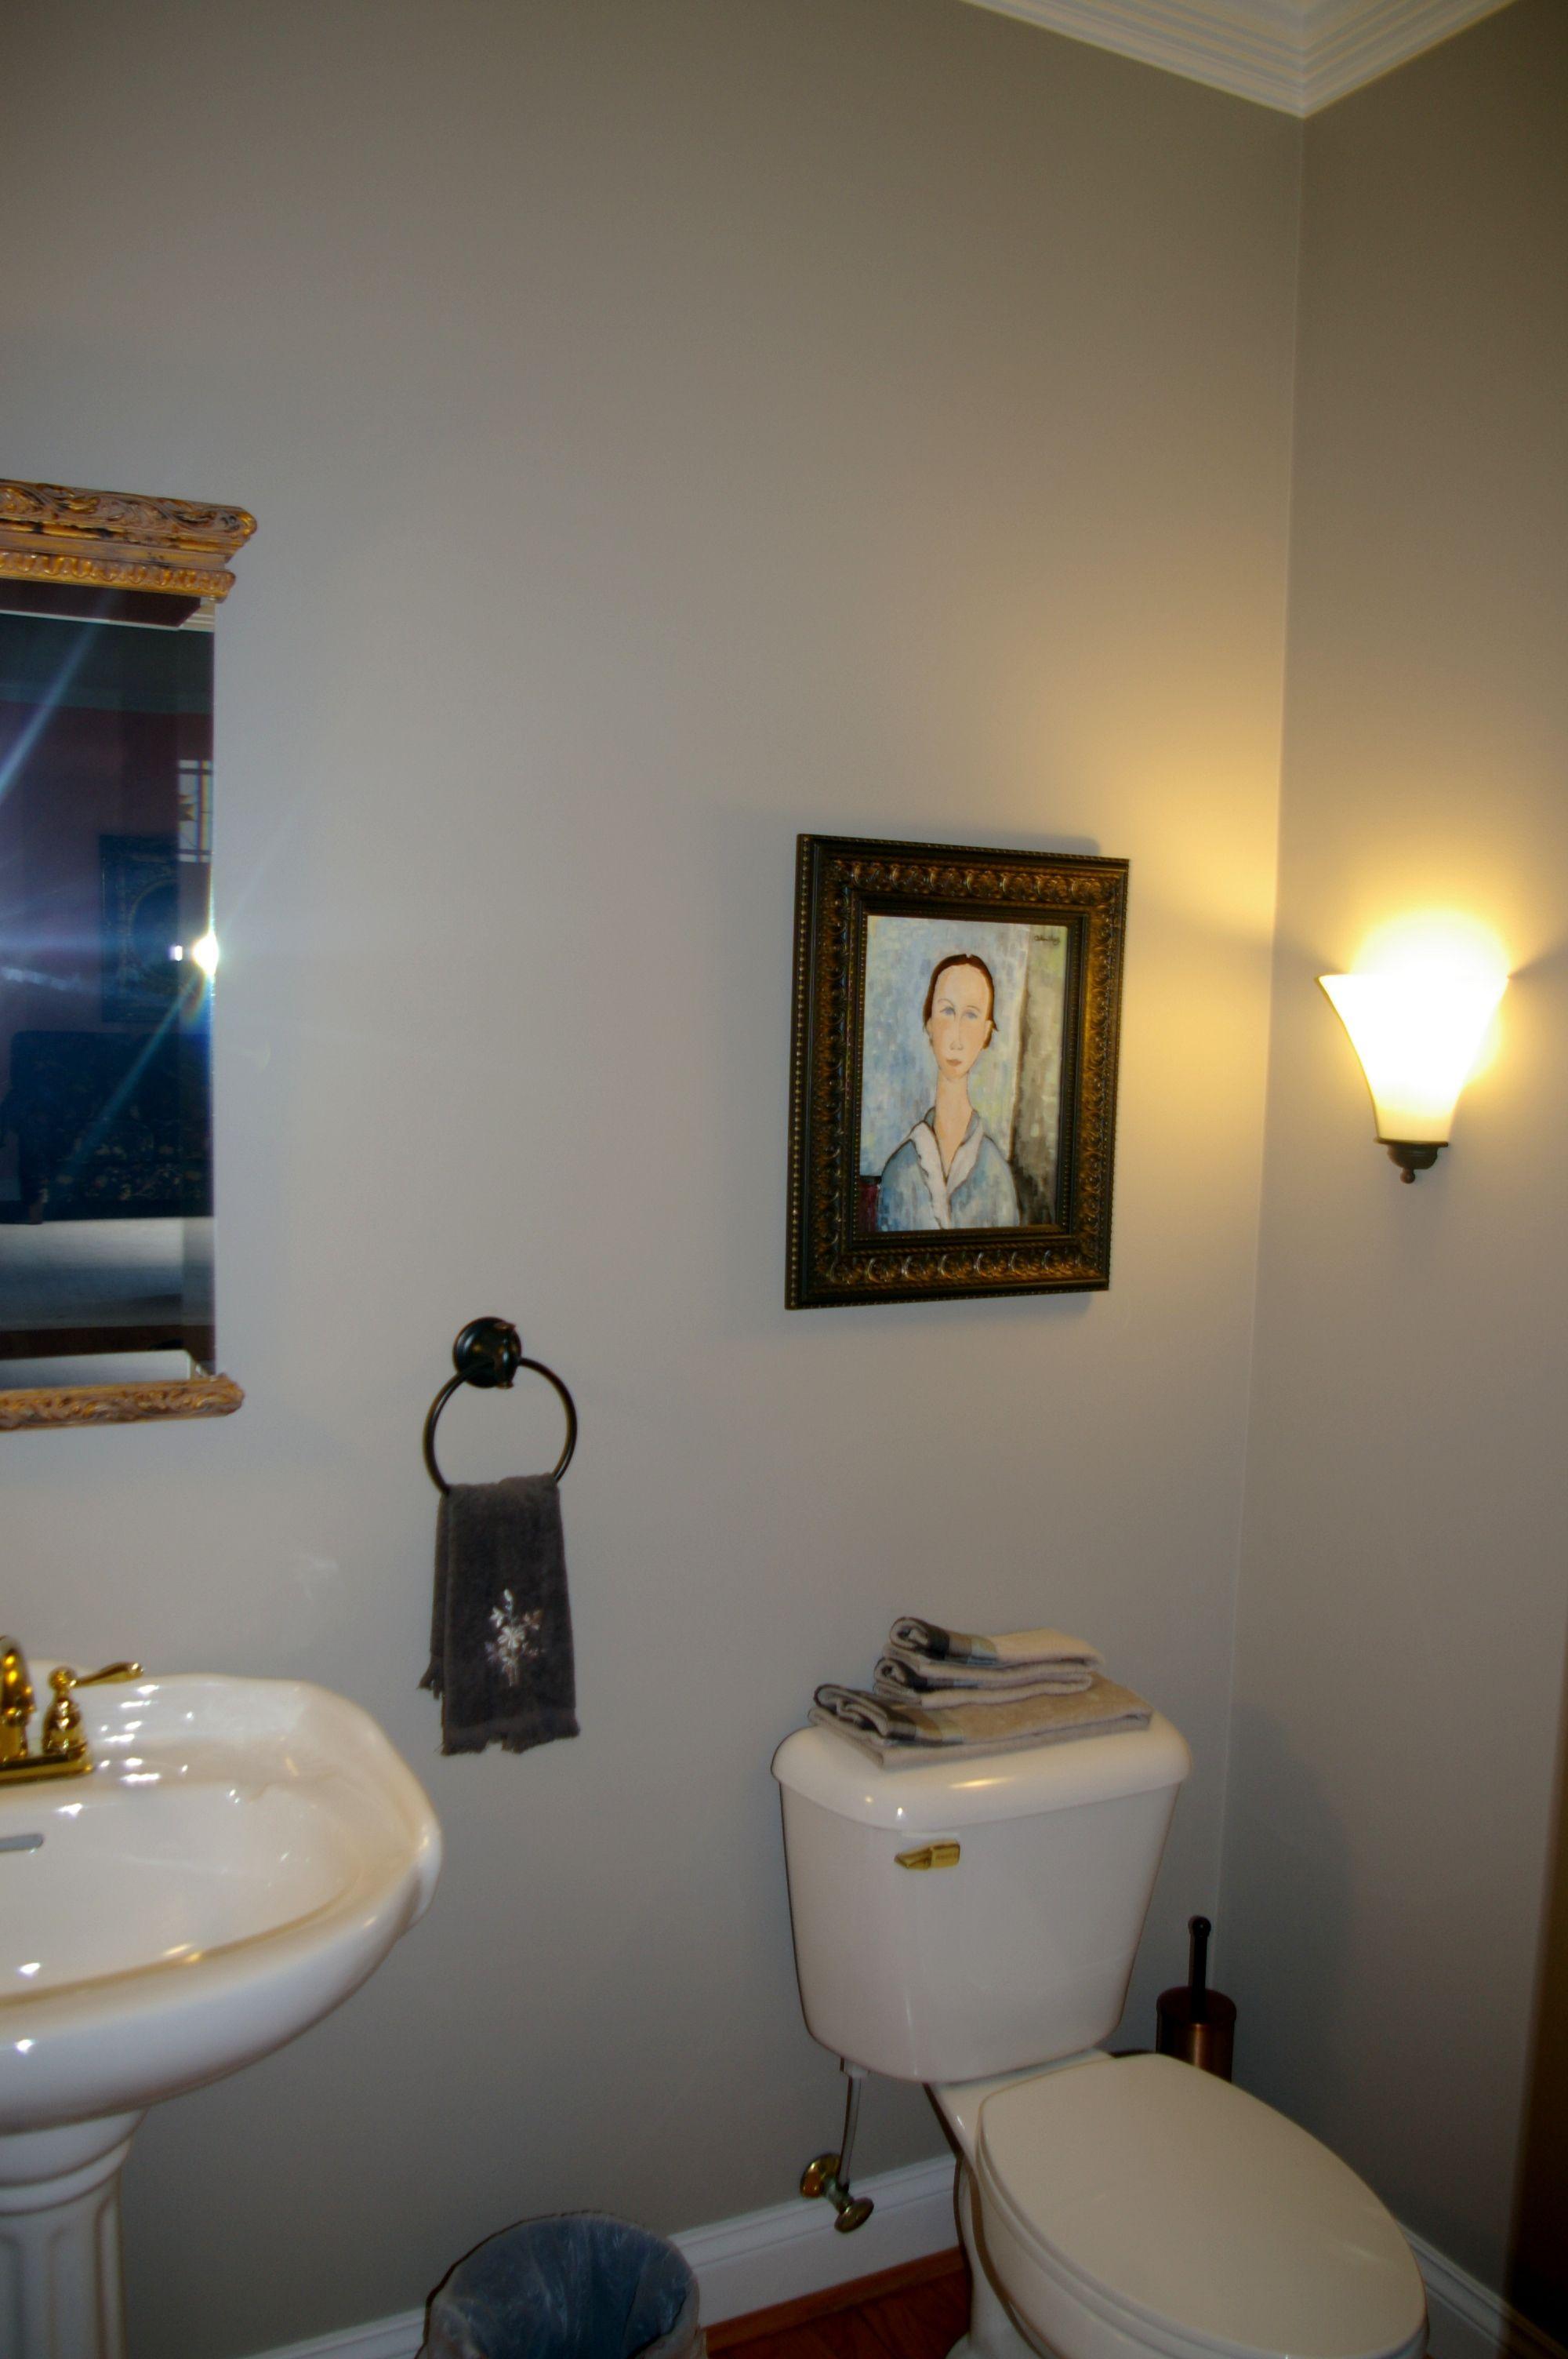 Blue Half Bathroom: Repainted The Old Parlor Half Bathroom From A Dark Navy